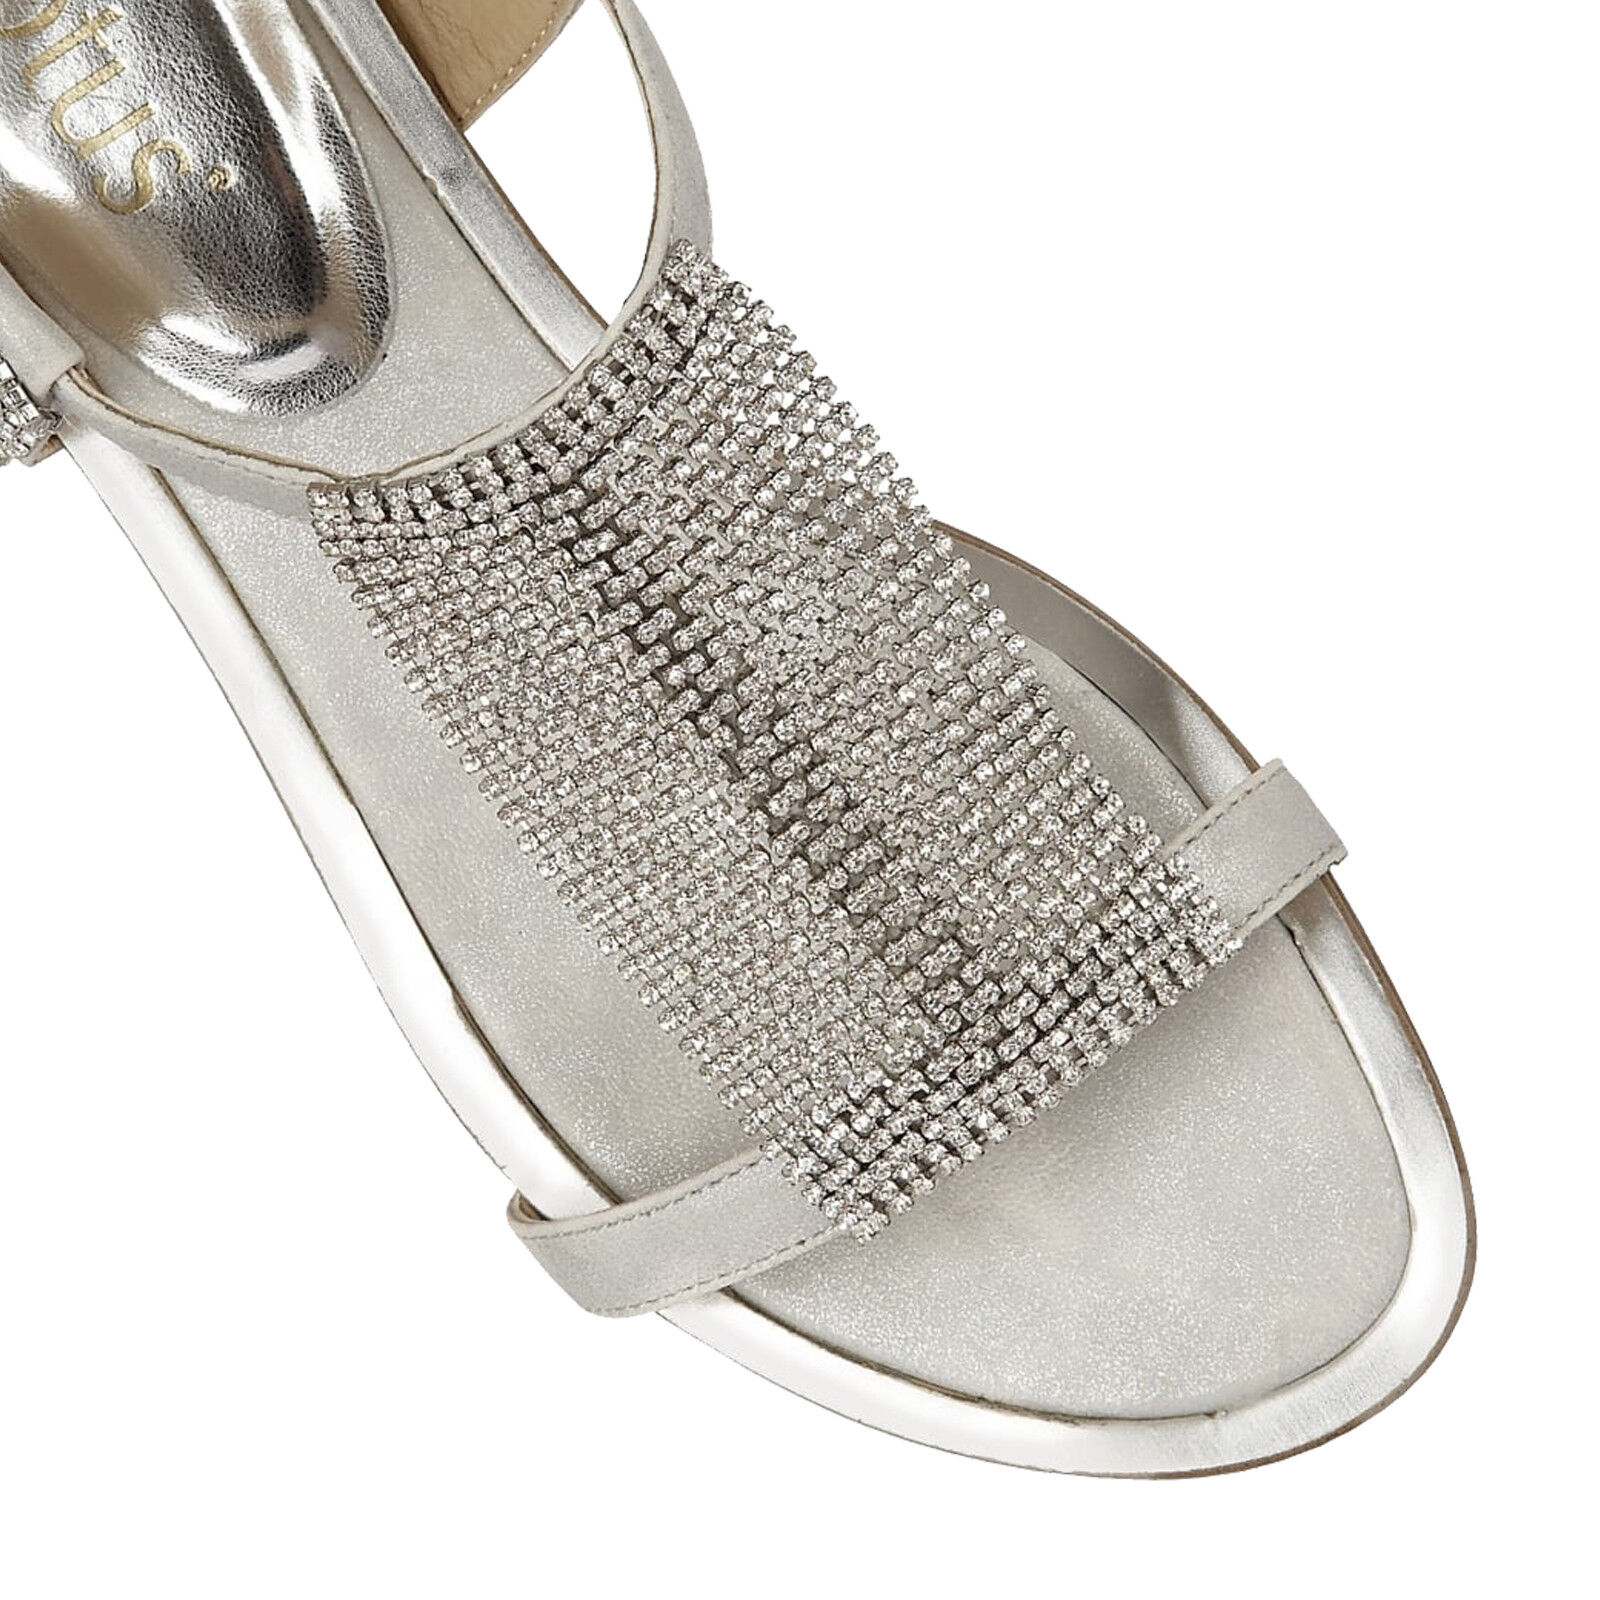 Femmes Lotus Agnetha Argent Strass  s s s Plates Boucle Fermeture Chaussures d694f3